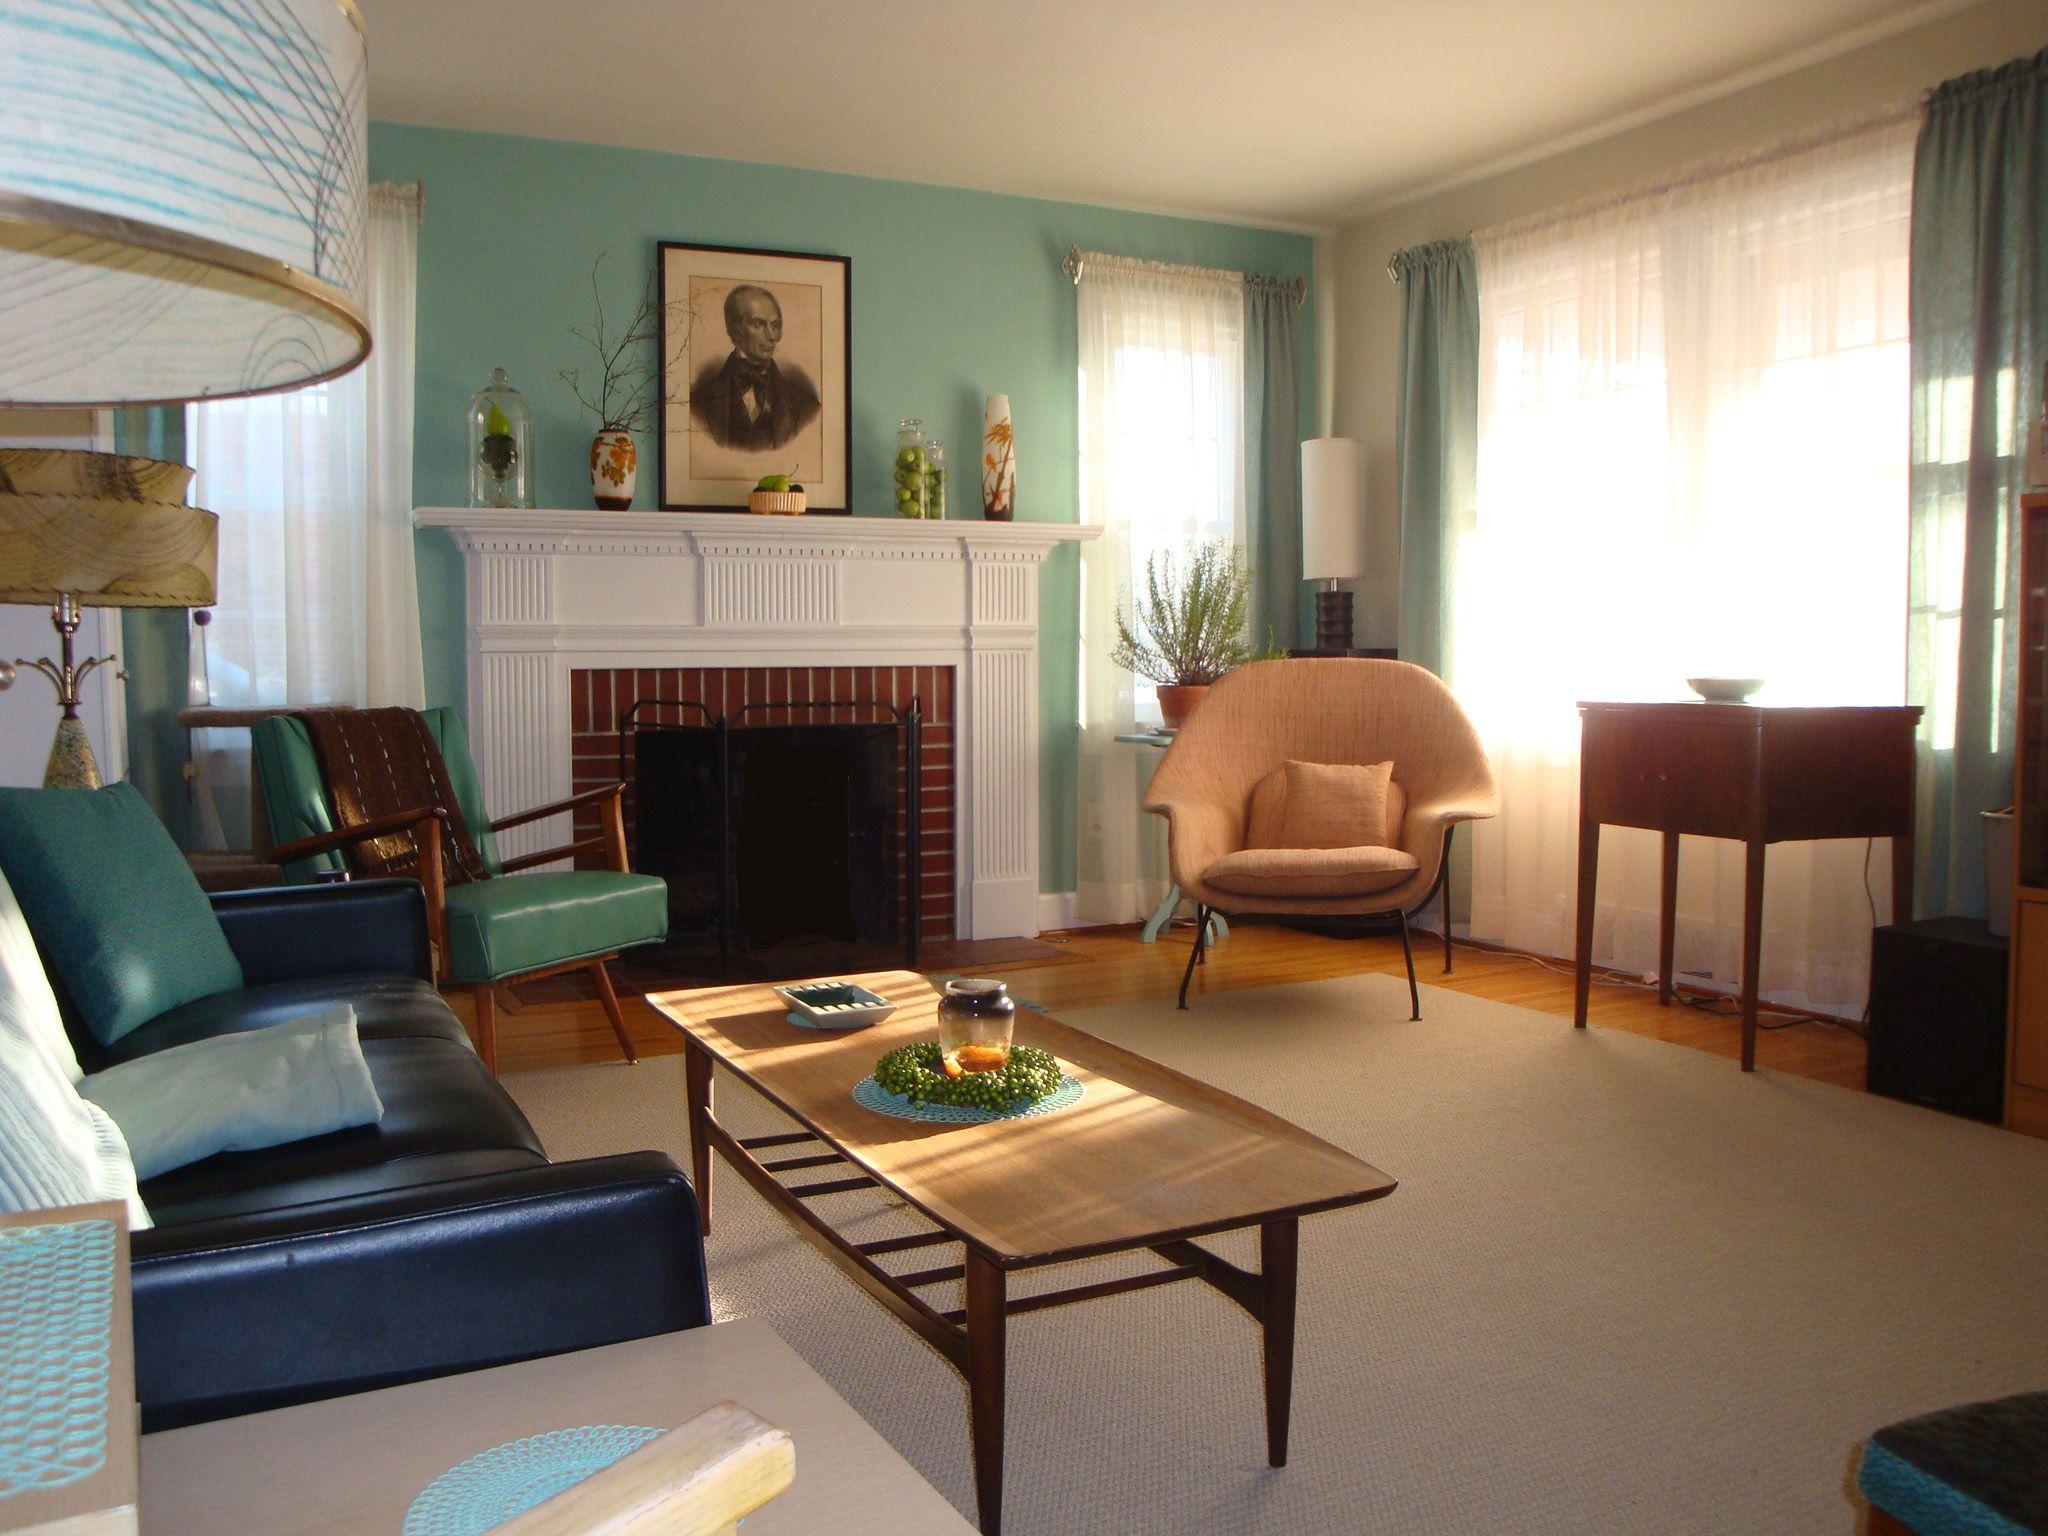 Decorating Fireplaces  10 Ideas From Reader Living Rooms  Mid Entrancing Modern Design For Living Room Design Inspiration